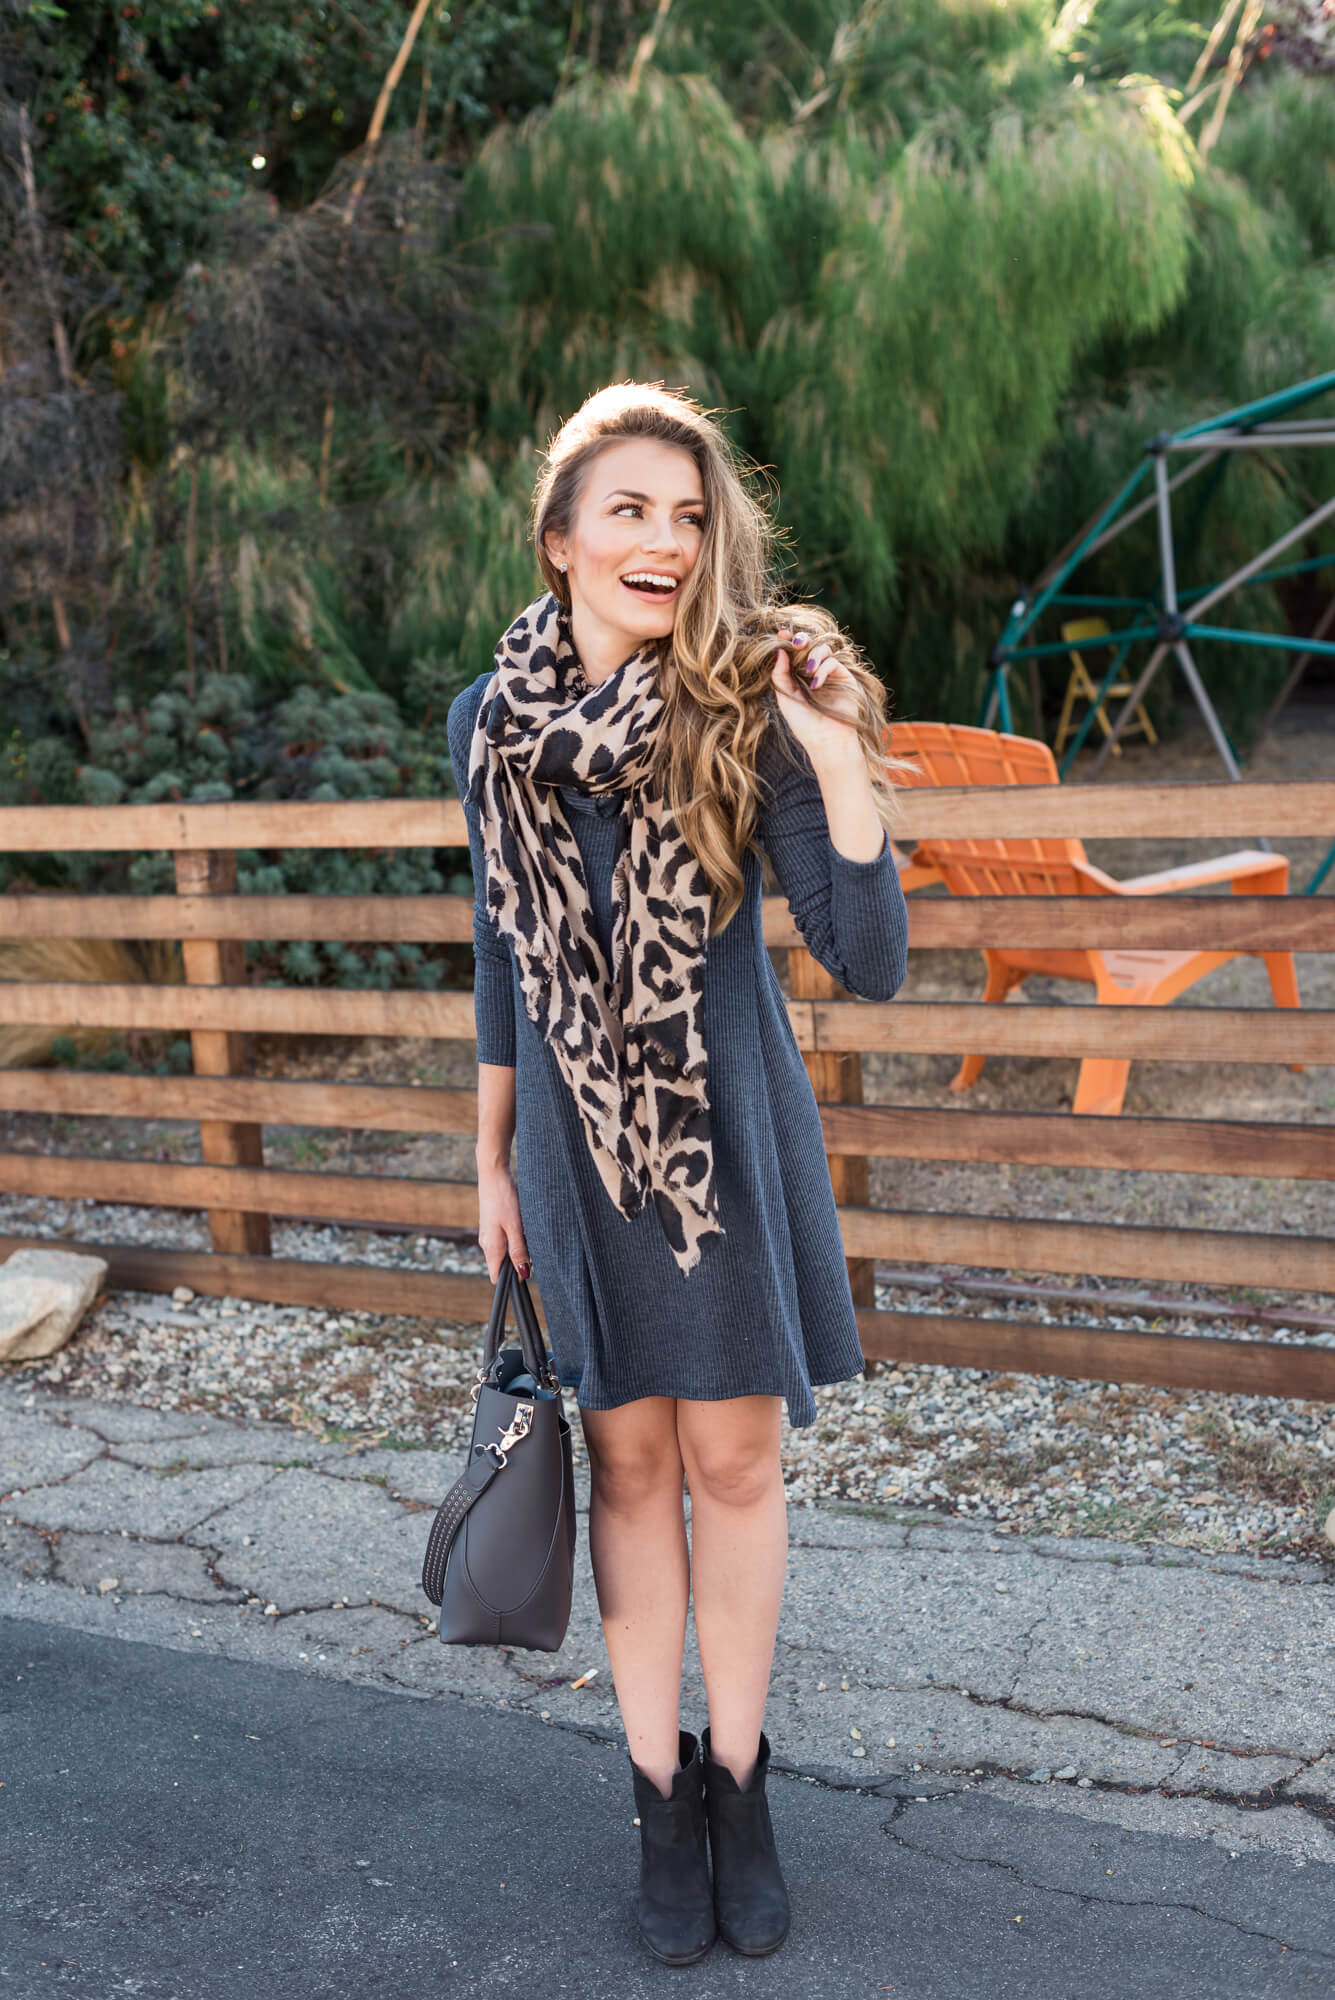 Outfit Under $50 angela lanter hello gorgeous